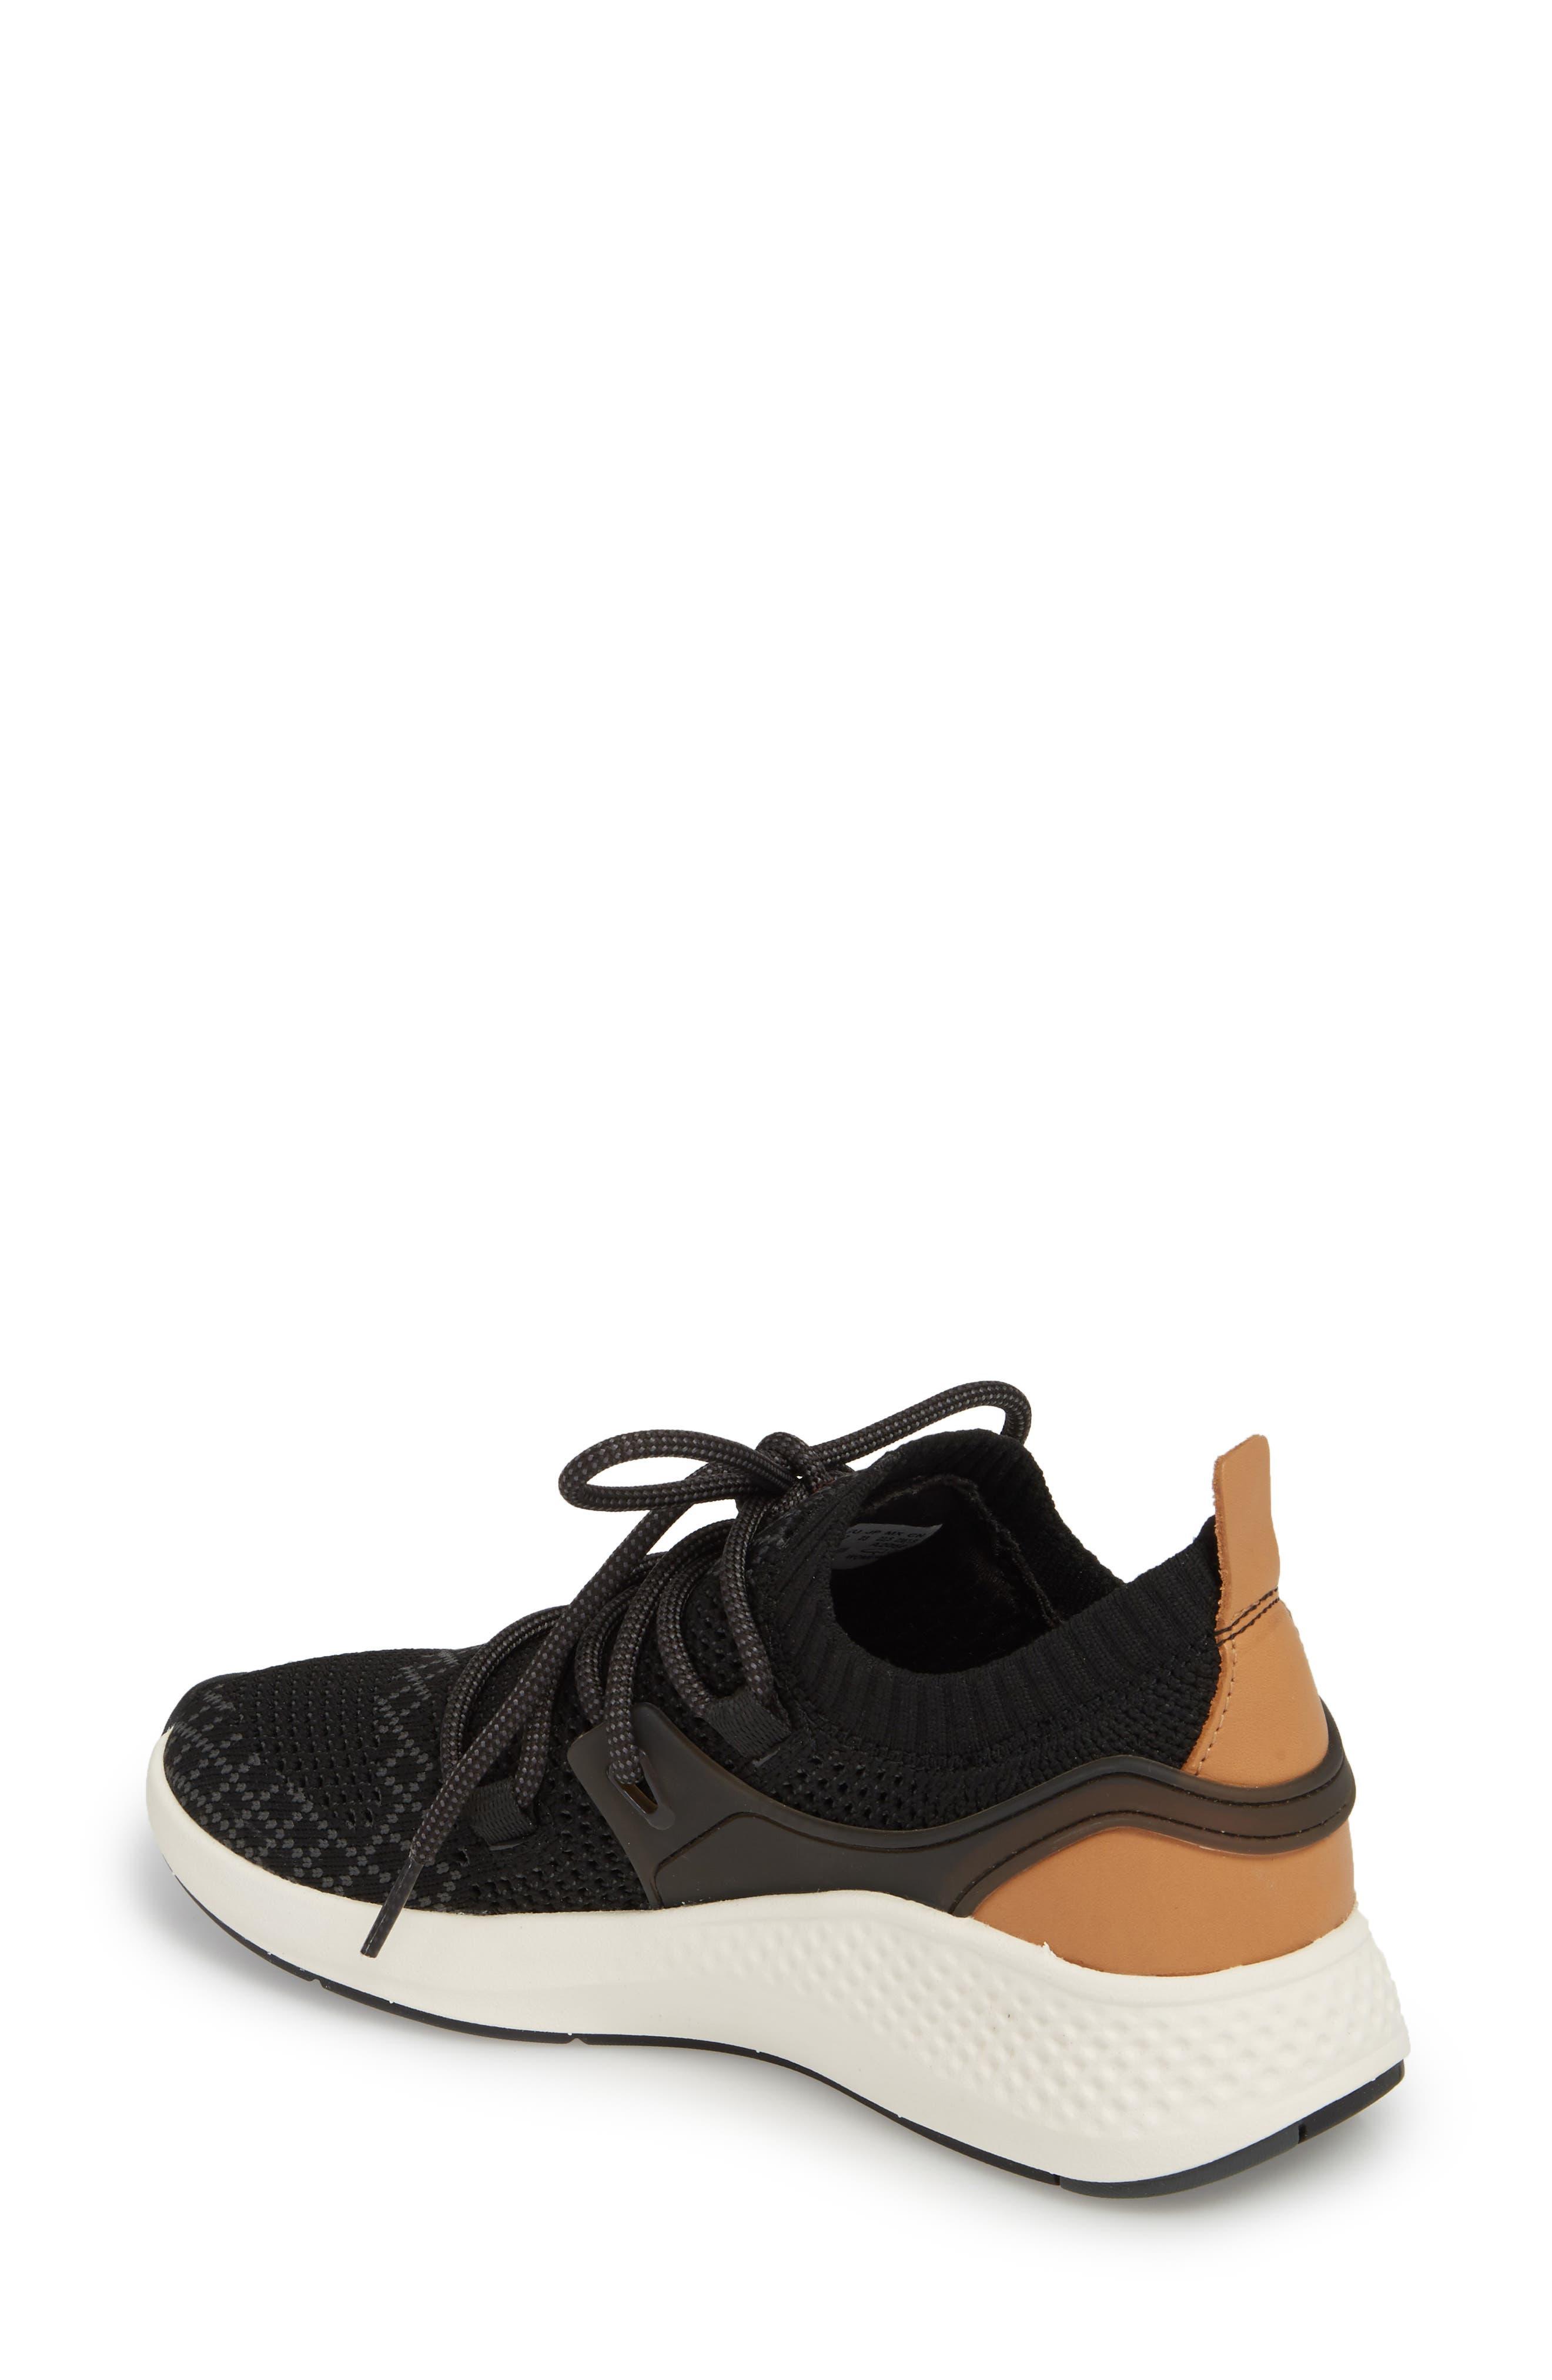 FlyRoam Go Knit Sneaker,                             Alternate thumbnail 2, color,                             Black Fabric